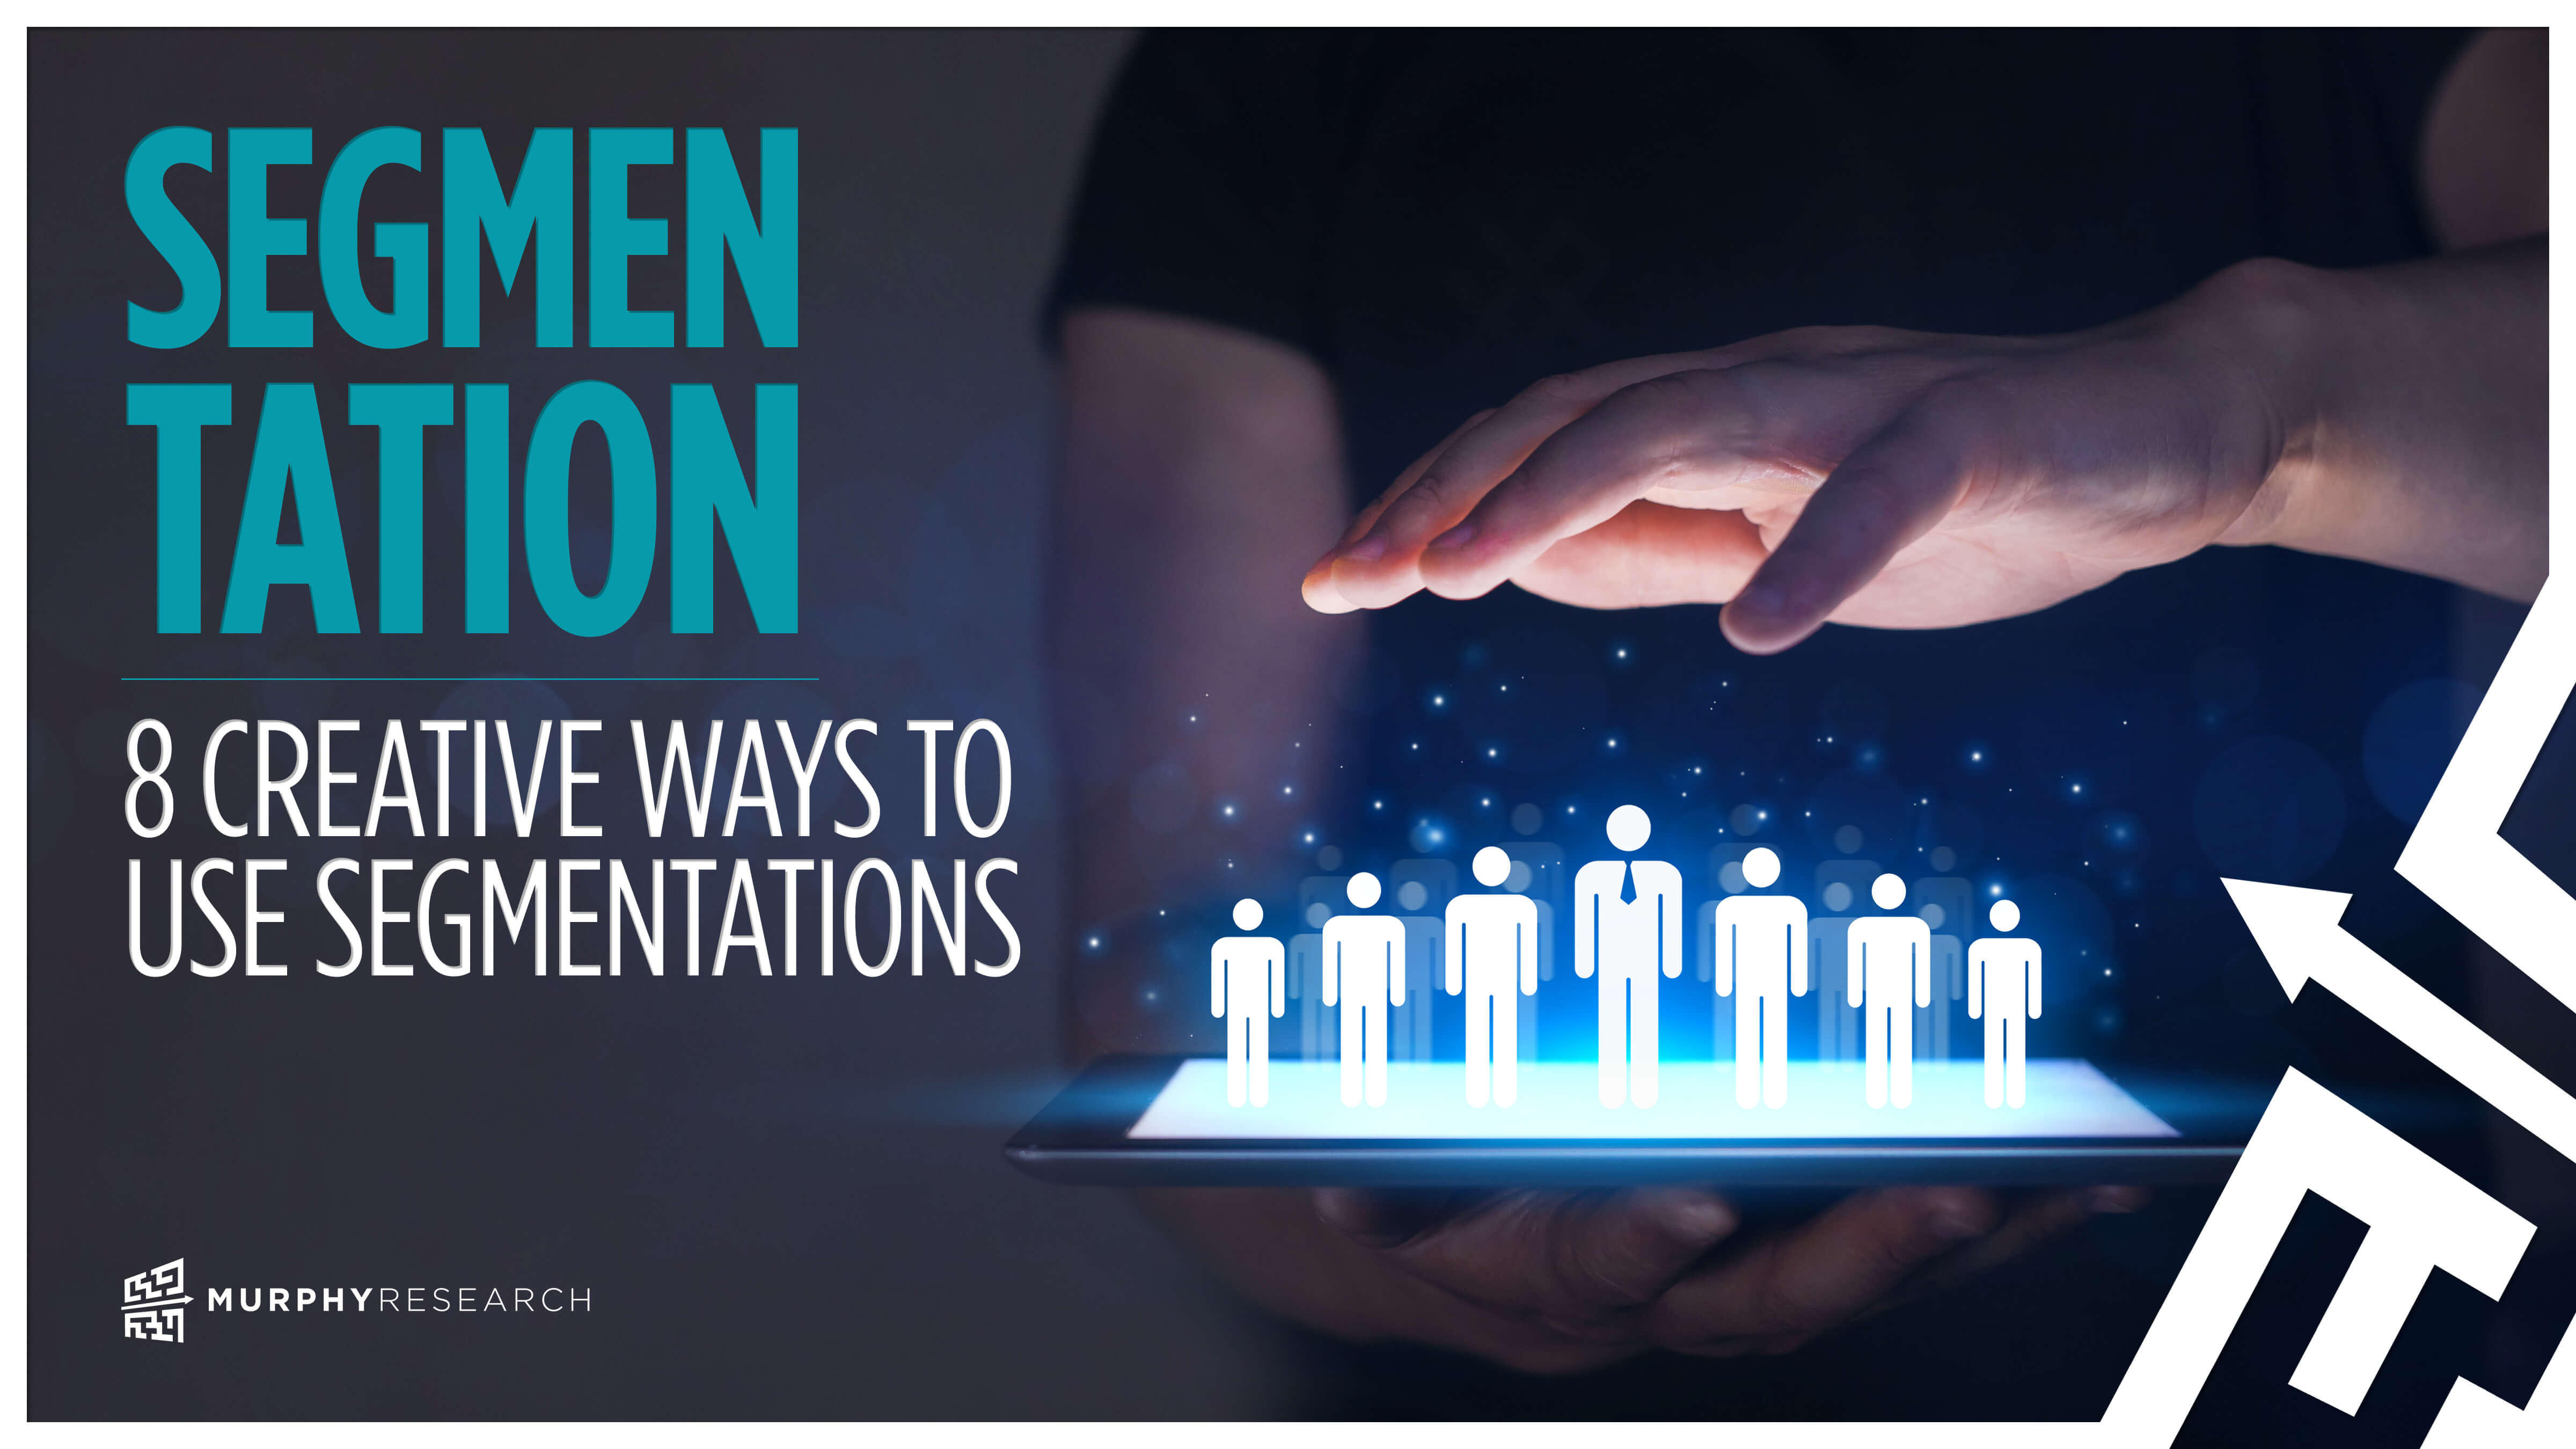 8 Creative Ways to Use Segmentations